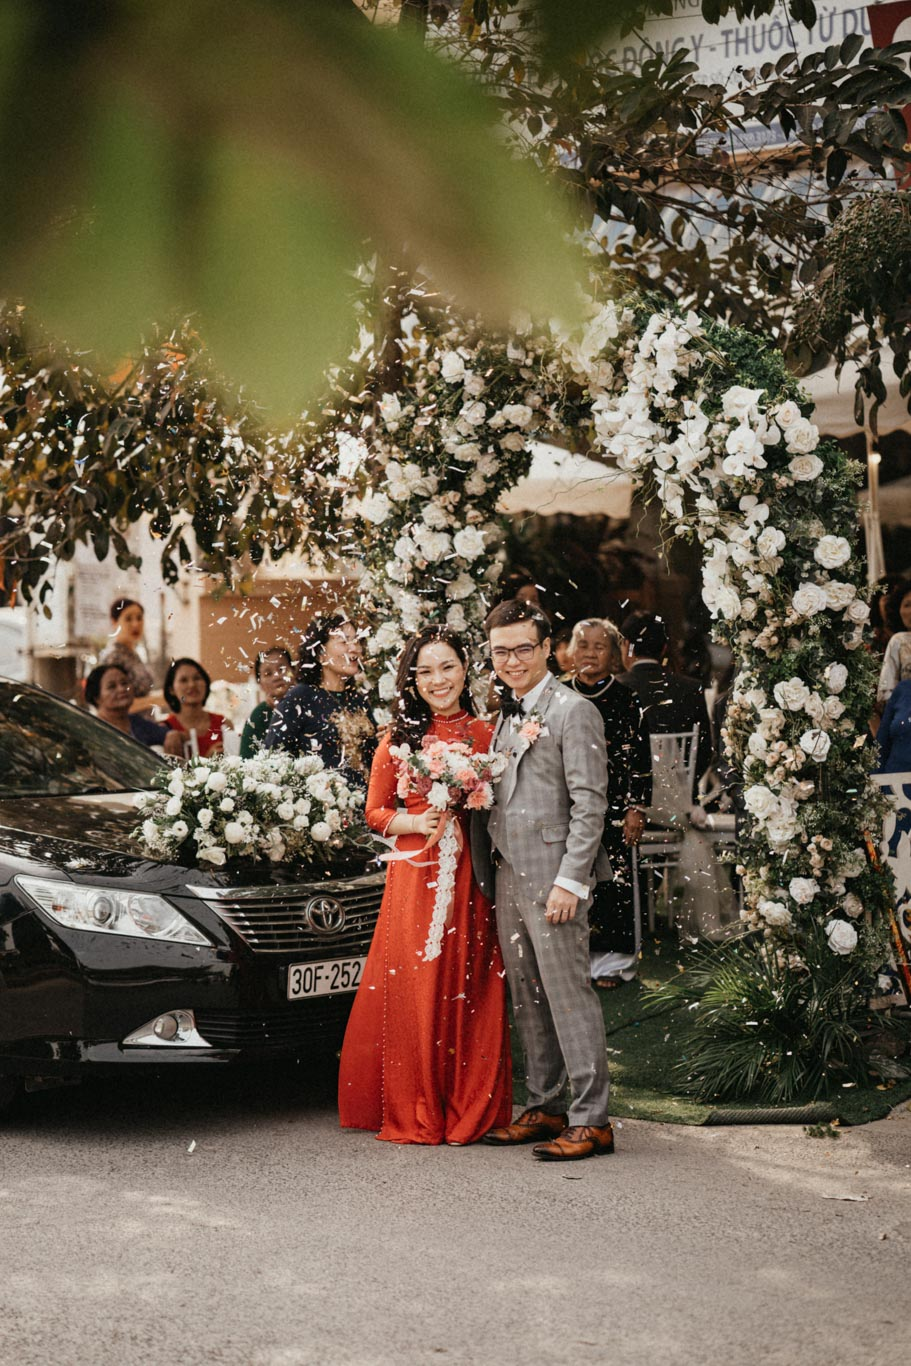 QUANG MINH & THU NGUYET wedding journalism -